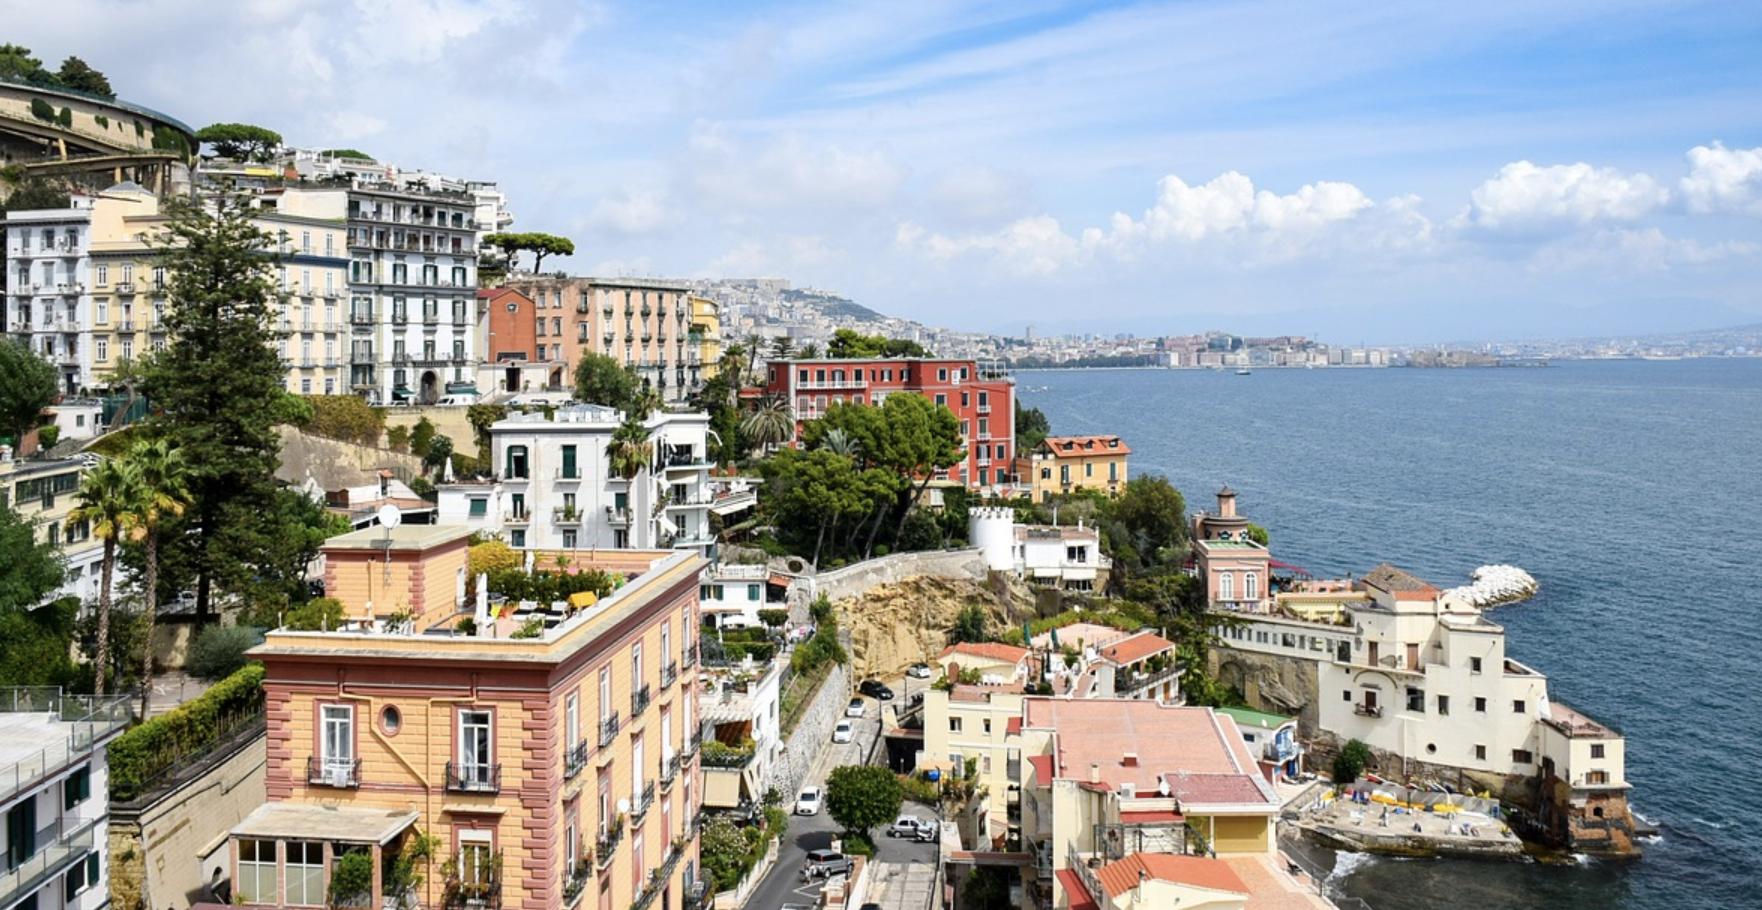 Posillipo, Napoli